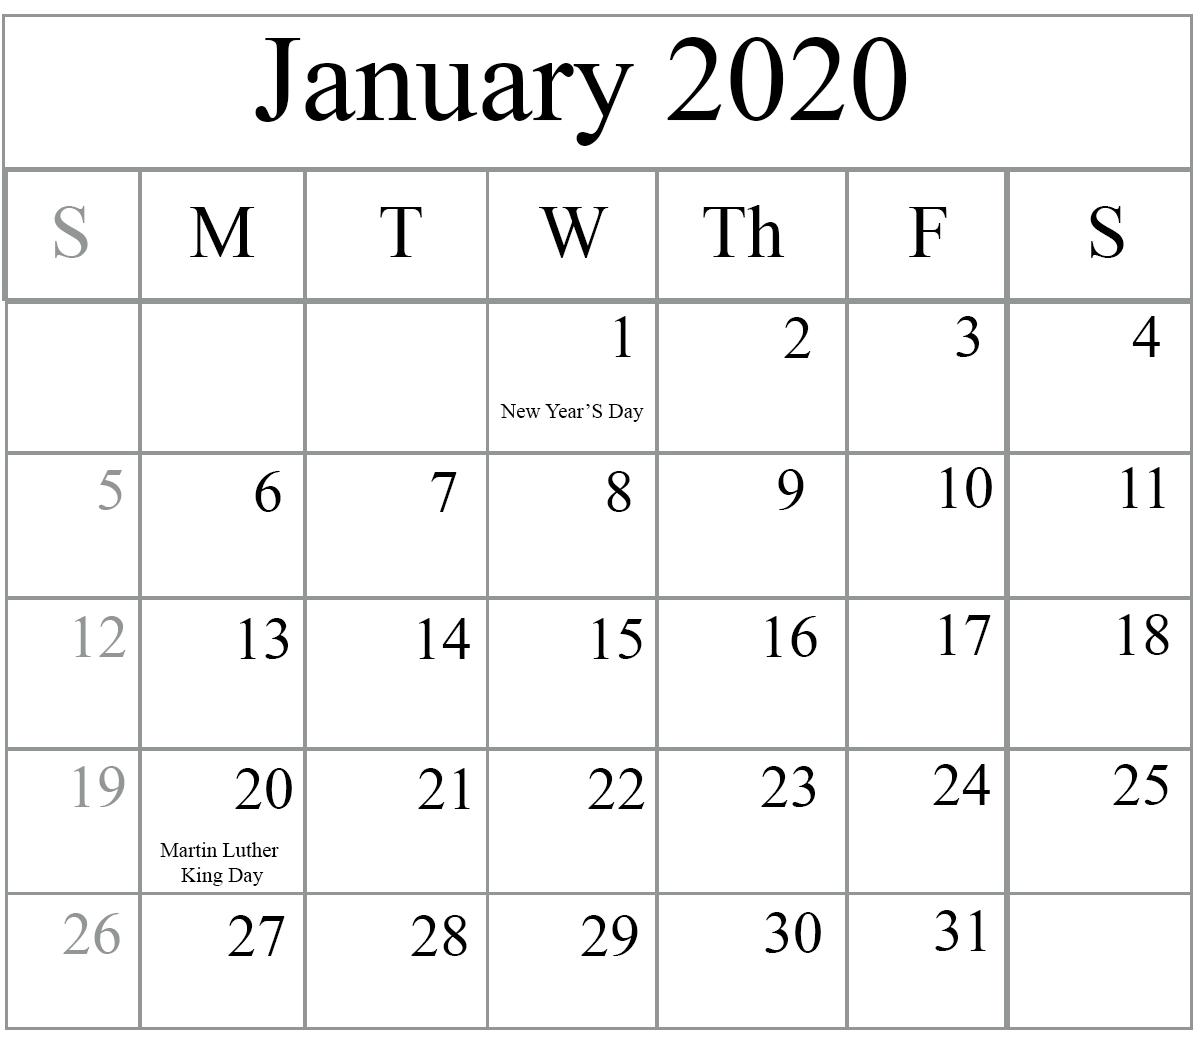 Free January 2020 Printable Calendar In Pdf, Excel & Word pertaining to Free Printable 2020 Calendar To I Can Edit